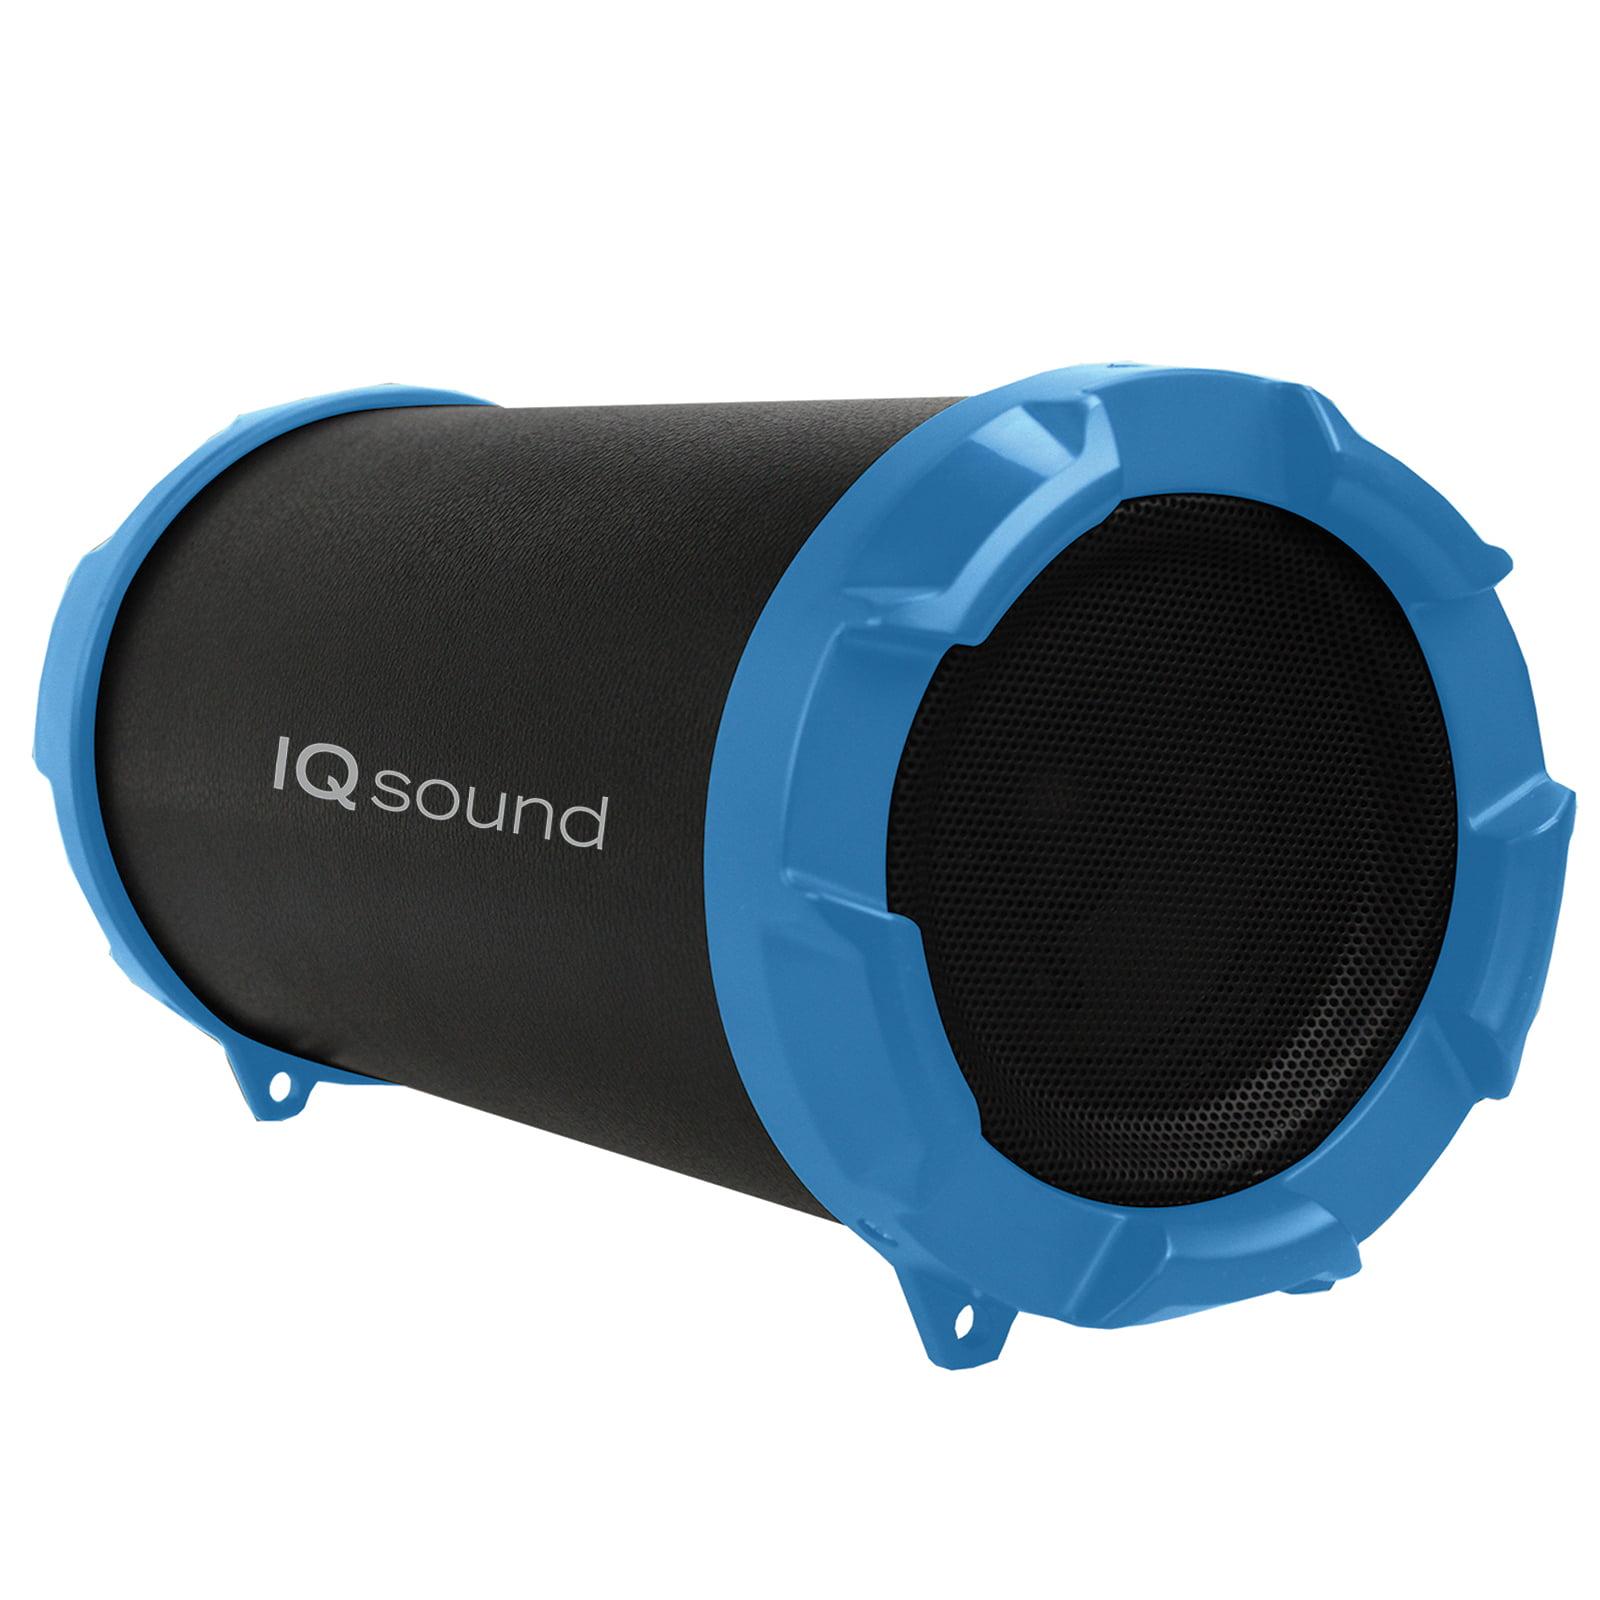 Supersonic Portable Speaker - Blue